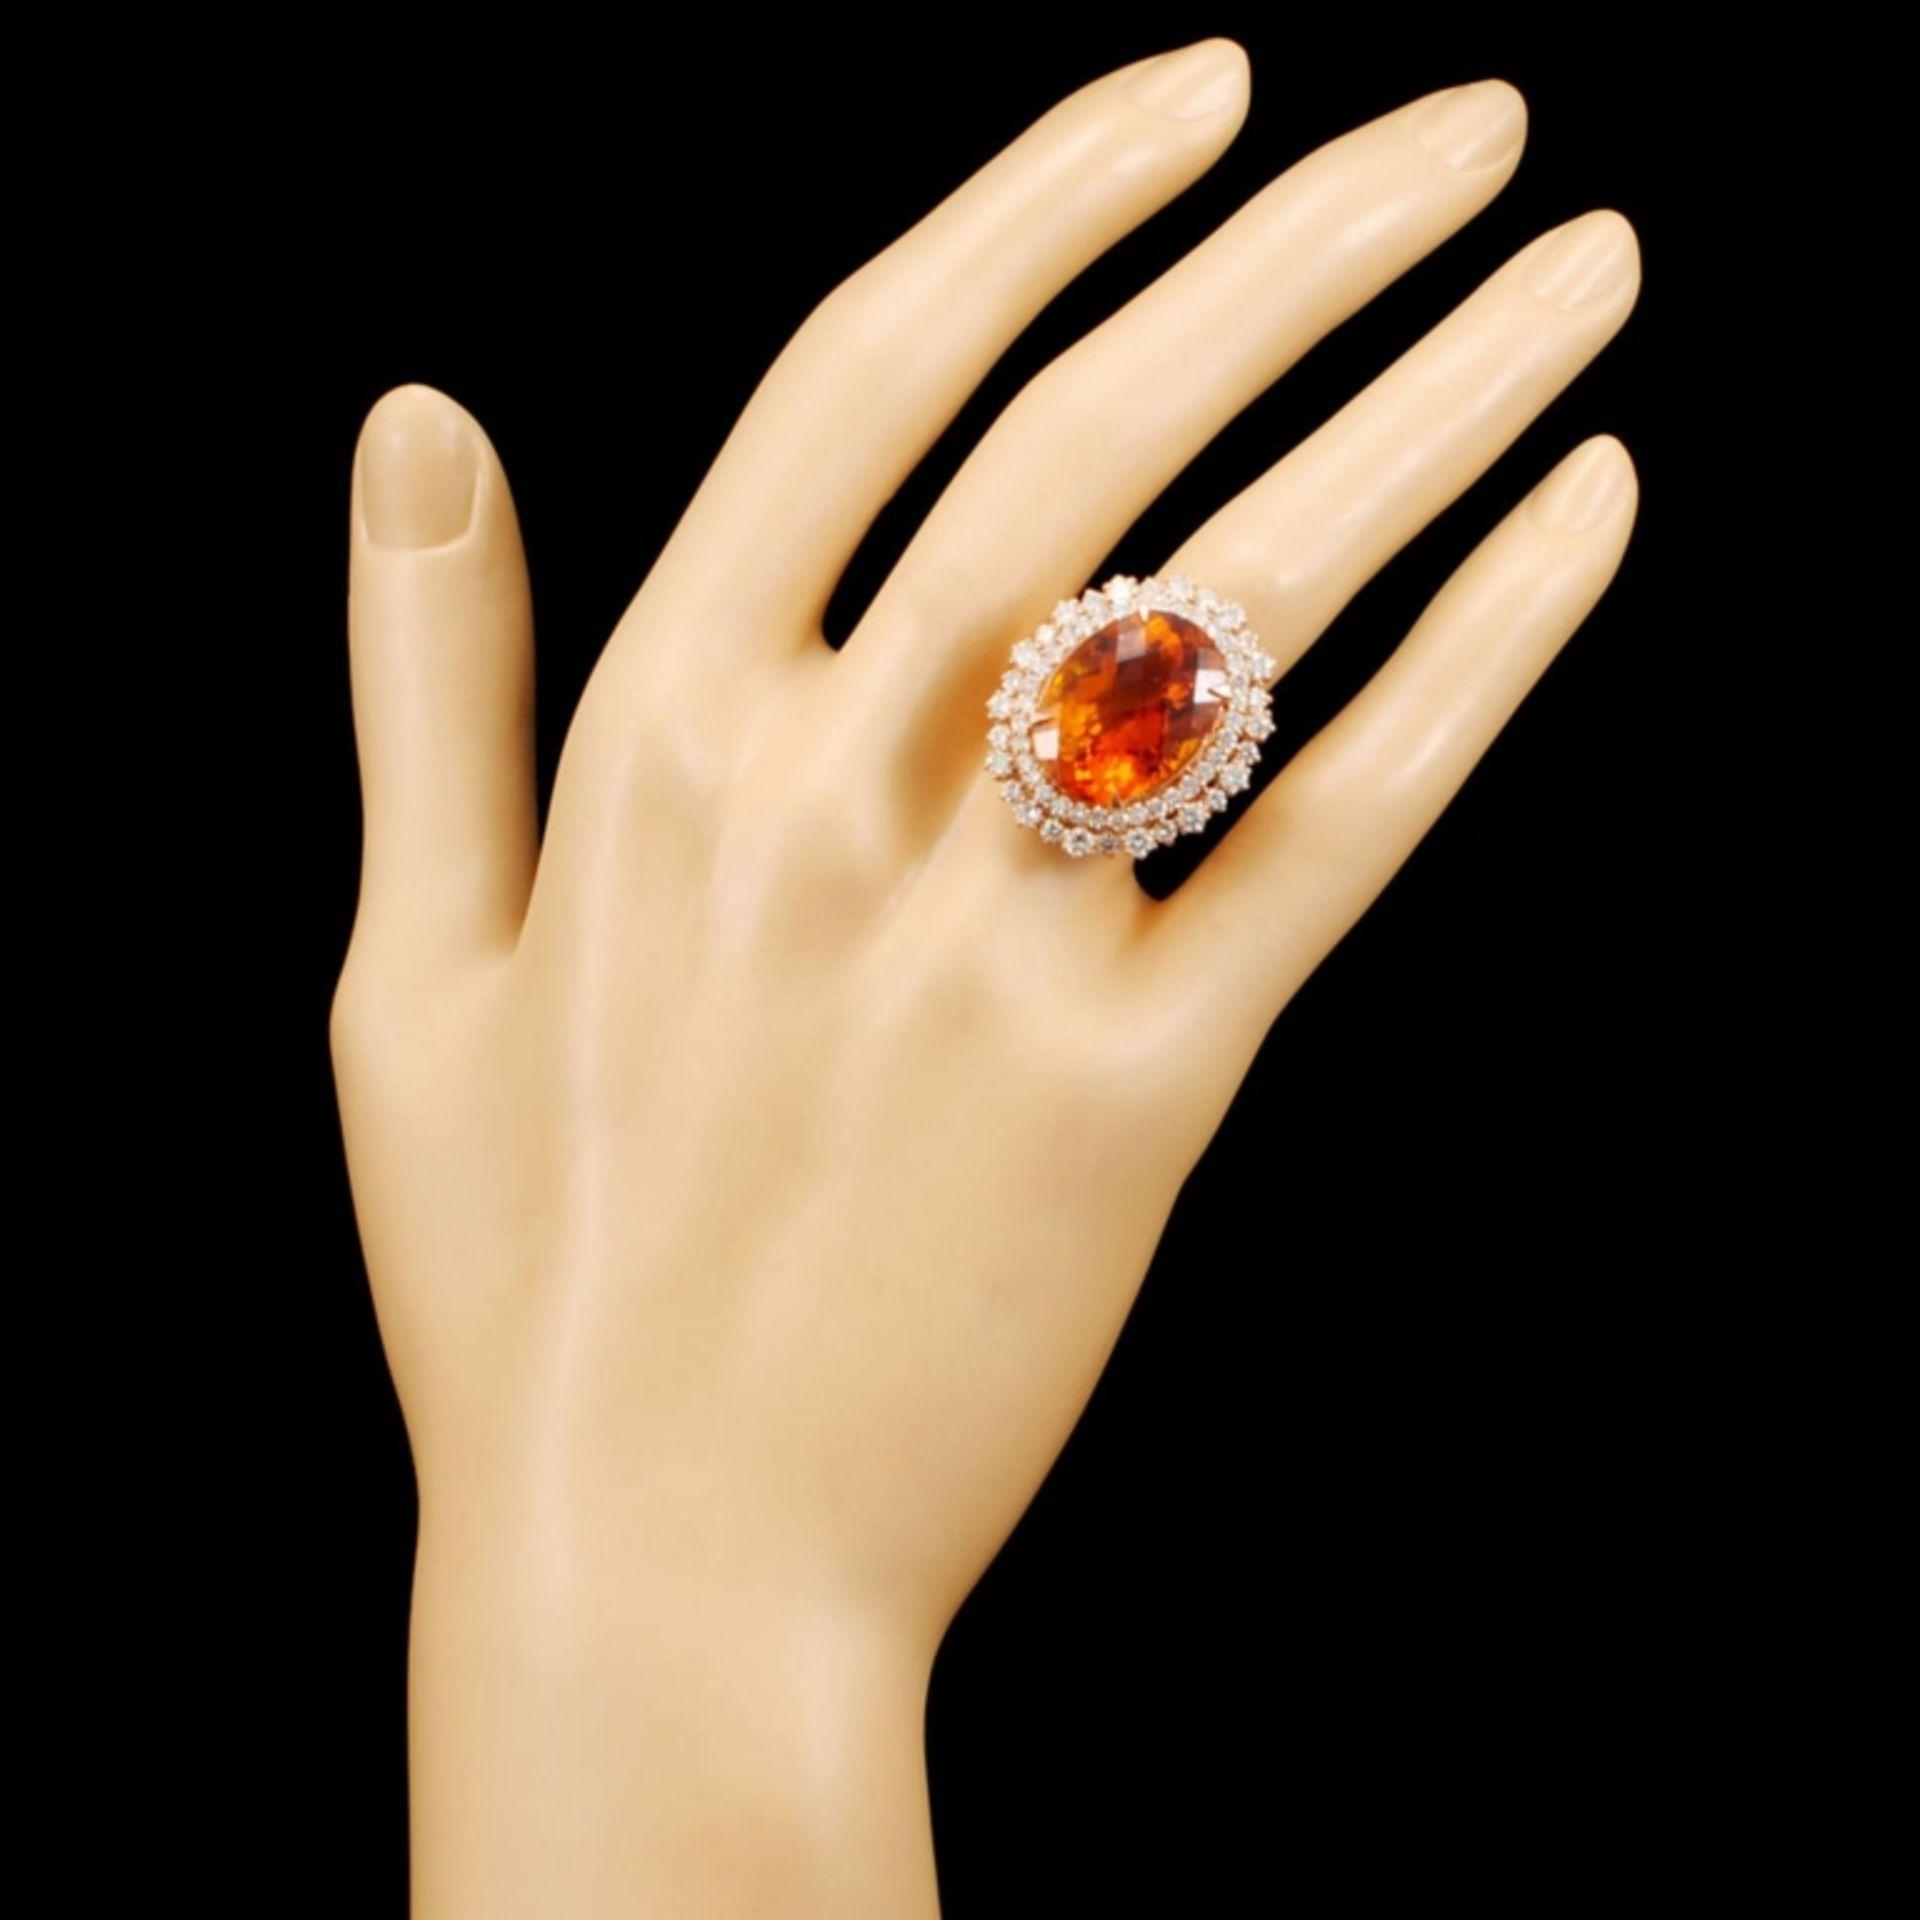 14K Gold 13.82ct Citrine & 2.30ctw Diamond Ring - Image 4 of 5